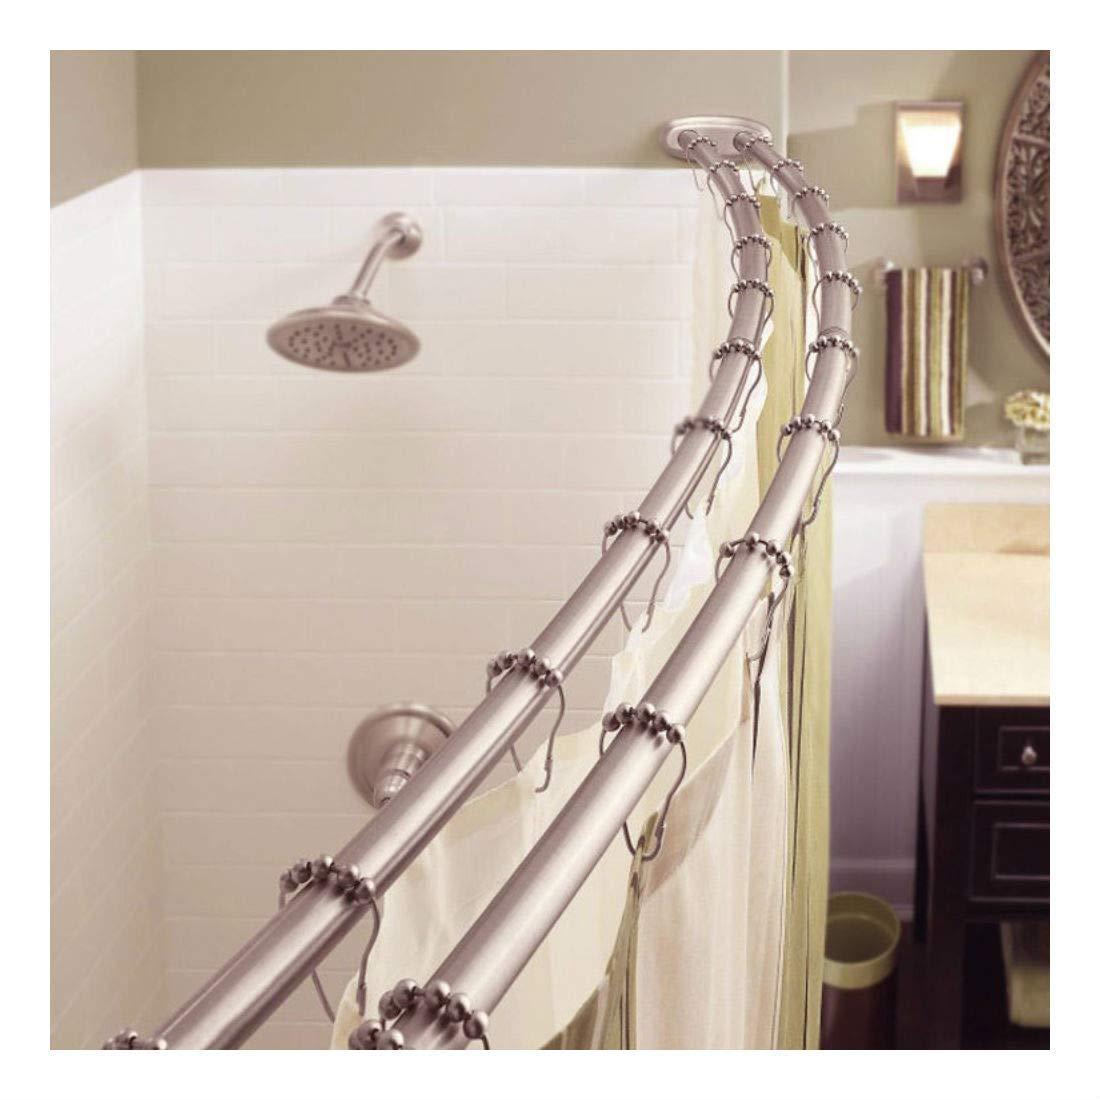 Cheap Bathtub Shower Rod Find Bathtub Shower Rod Deals On